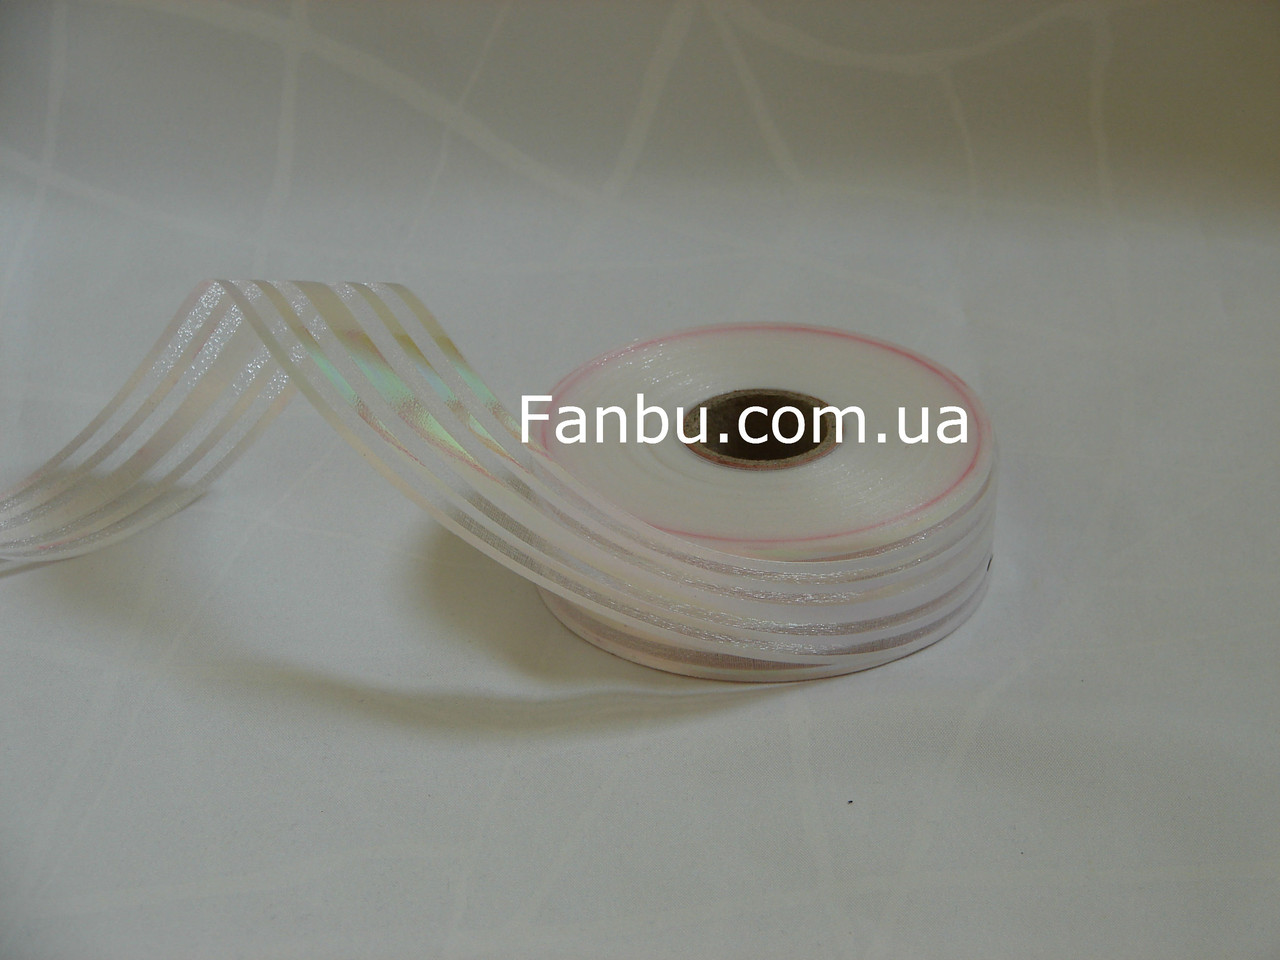 Белая лента для бантов с красивым переливом(1рулон-25ярдов)ширина 3 см, фото 1